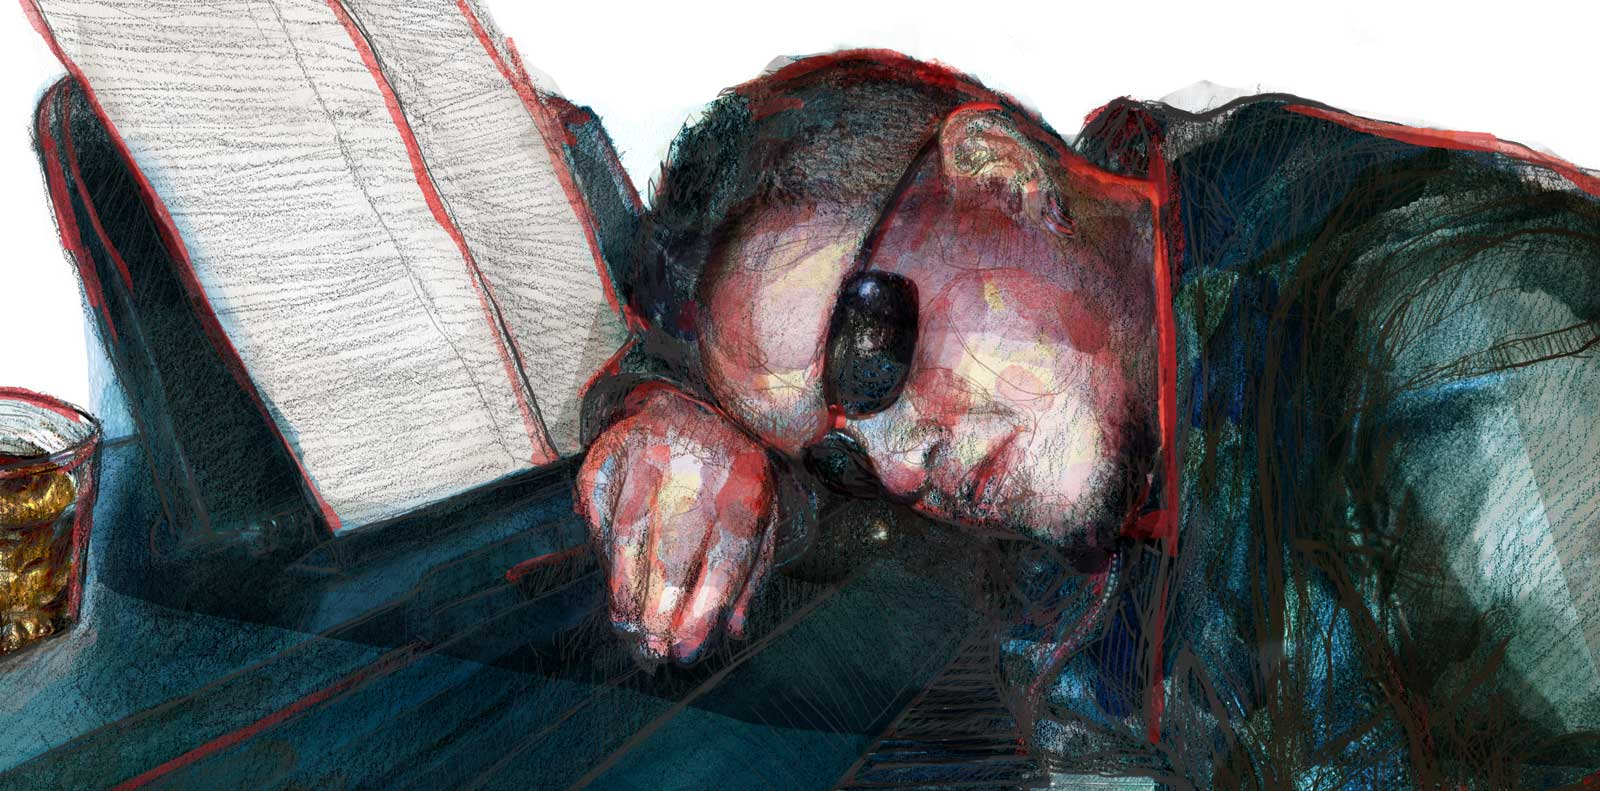 Mario Jodra illustration Art - The pianist (detail)